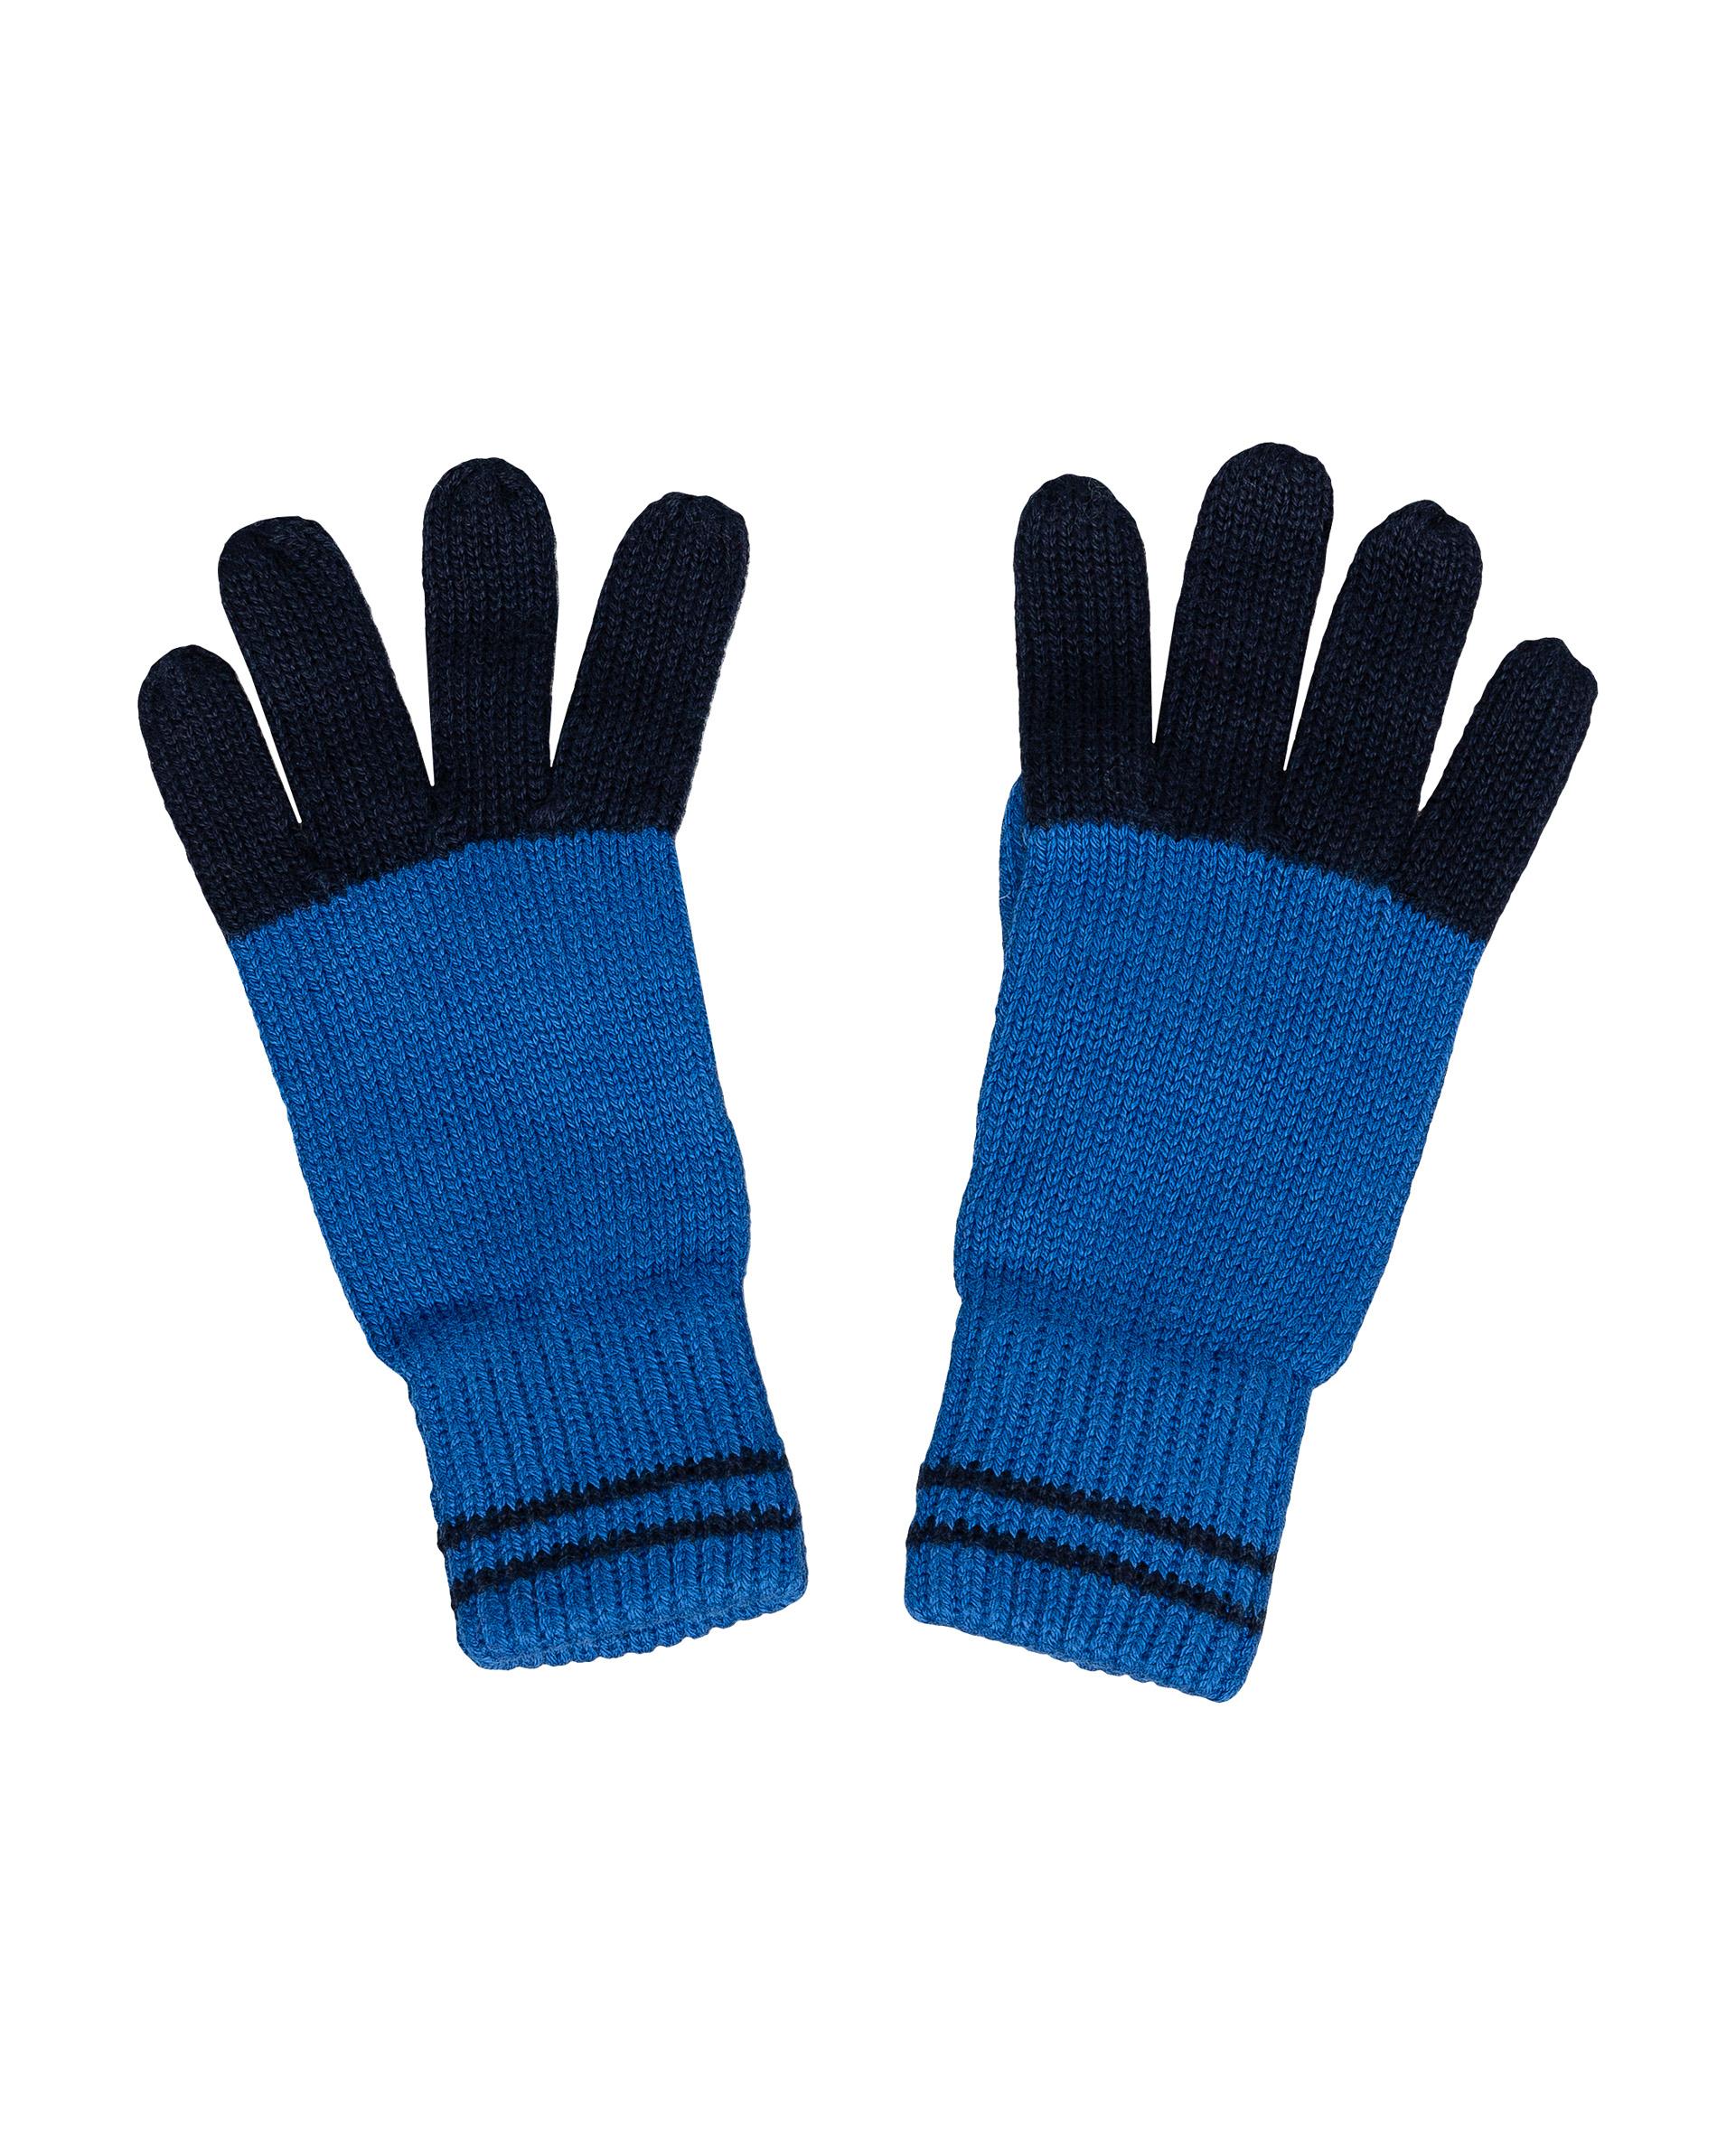 Перчатки для мальчиков Gulliver, цв. синий, р.14